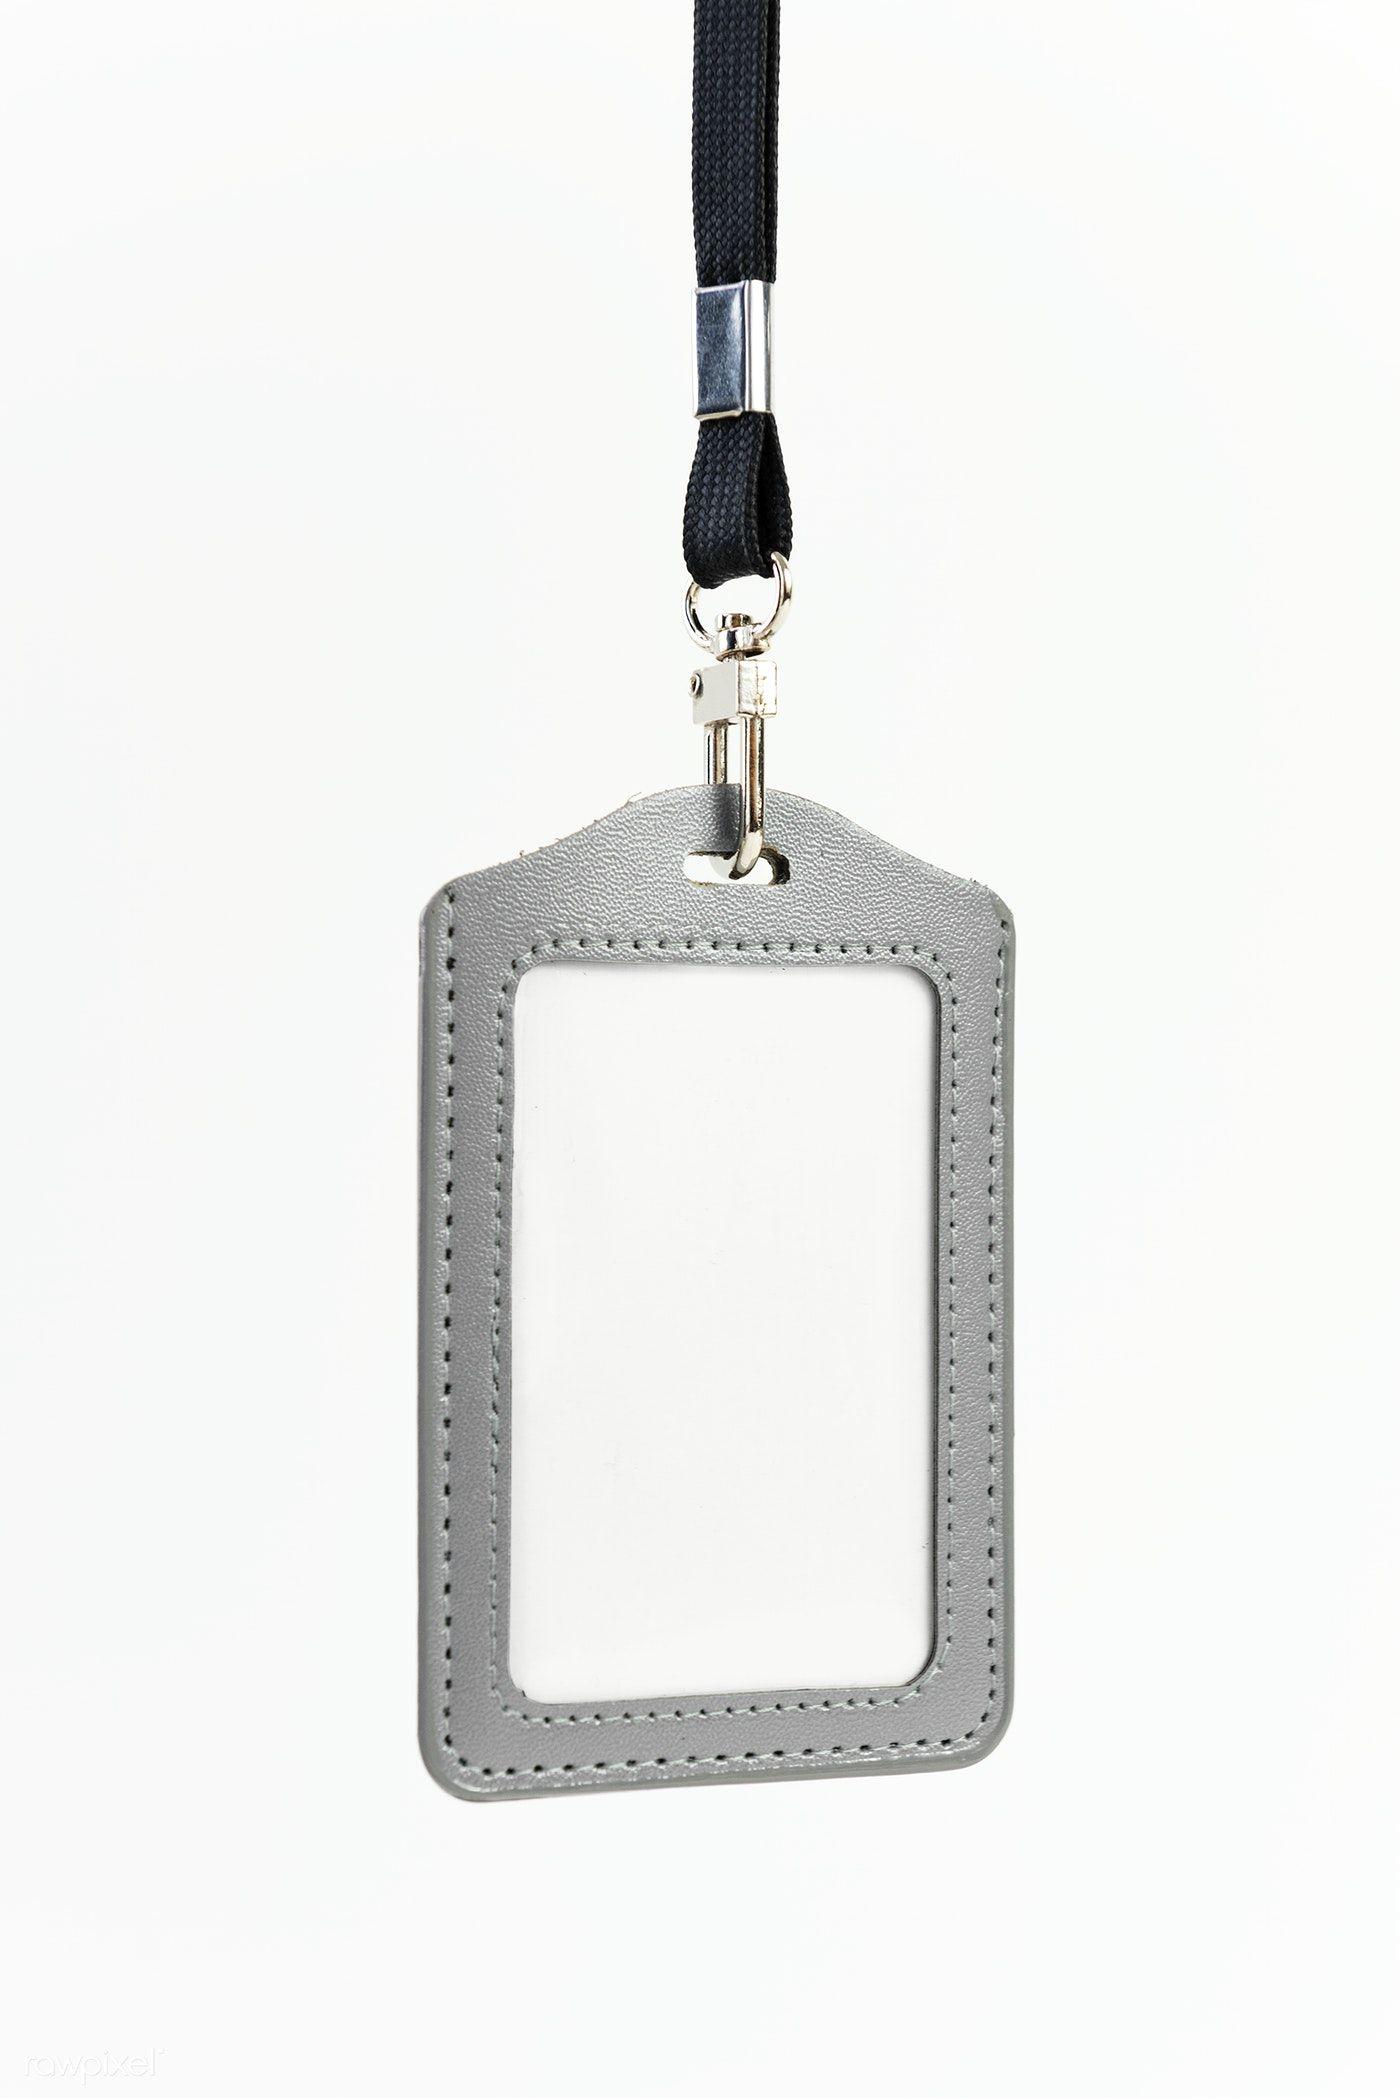 Id Card Holder Mockup Transparent Png Premium Image By Rawpixel Com Master Card